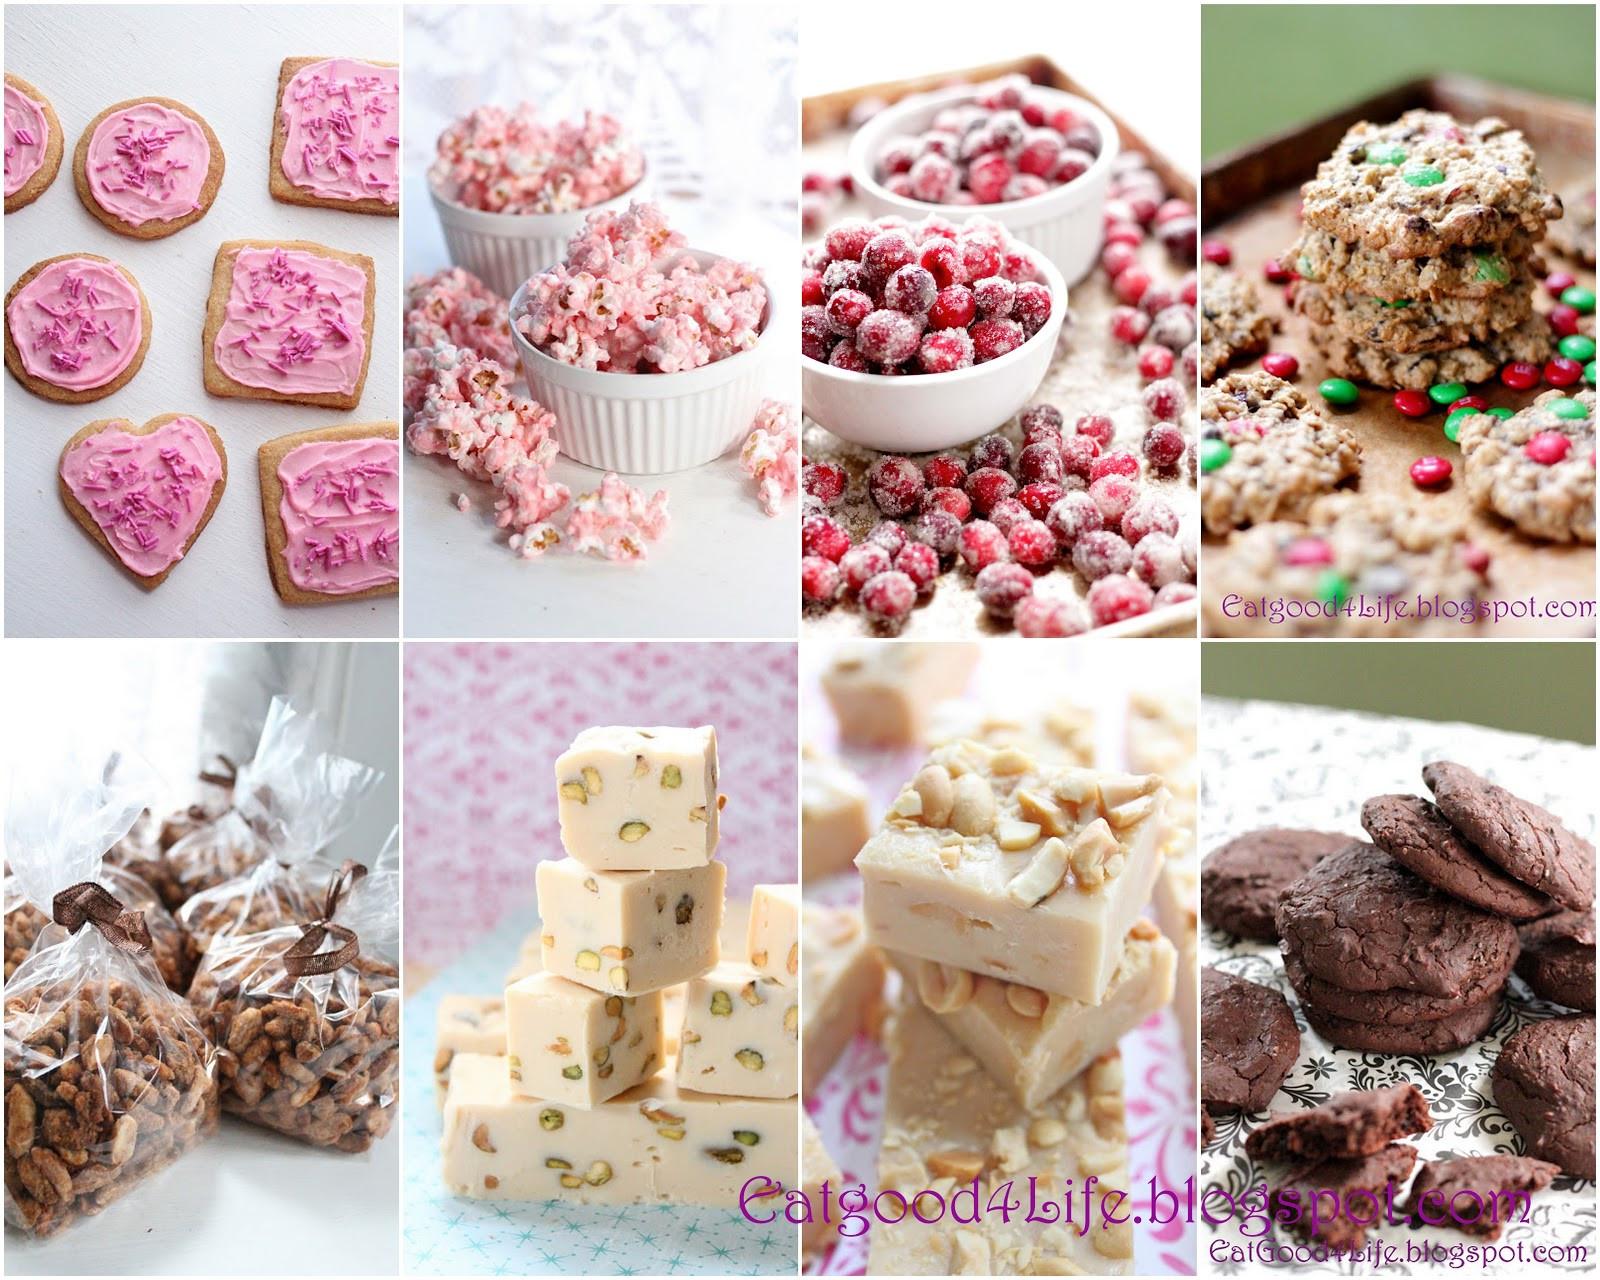 Christmas Baking Gift Ideas  My Top 16 Christmas t baking ideas